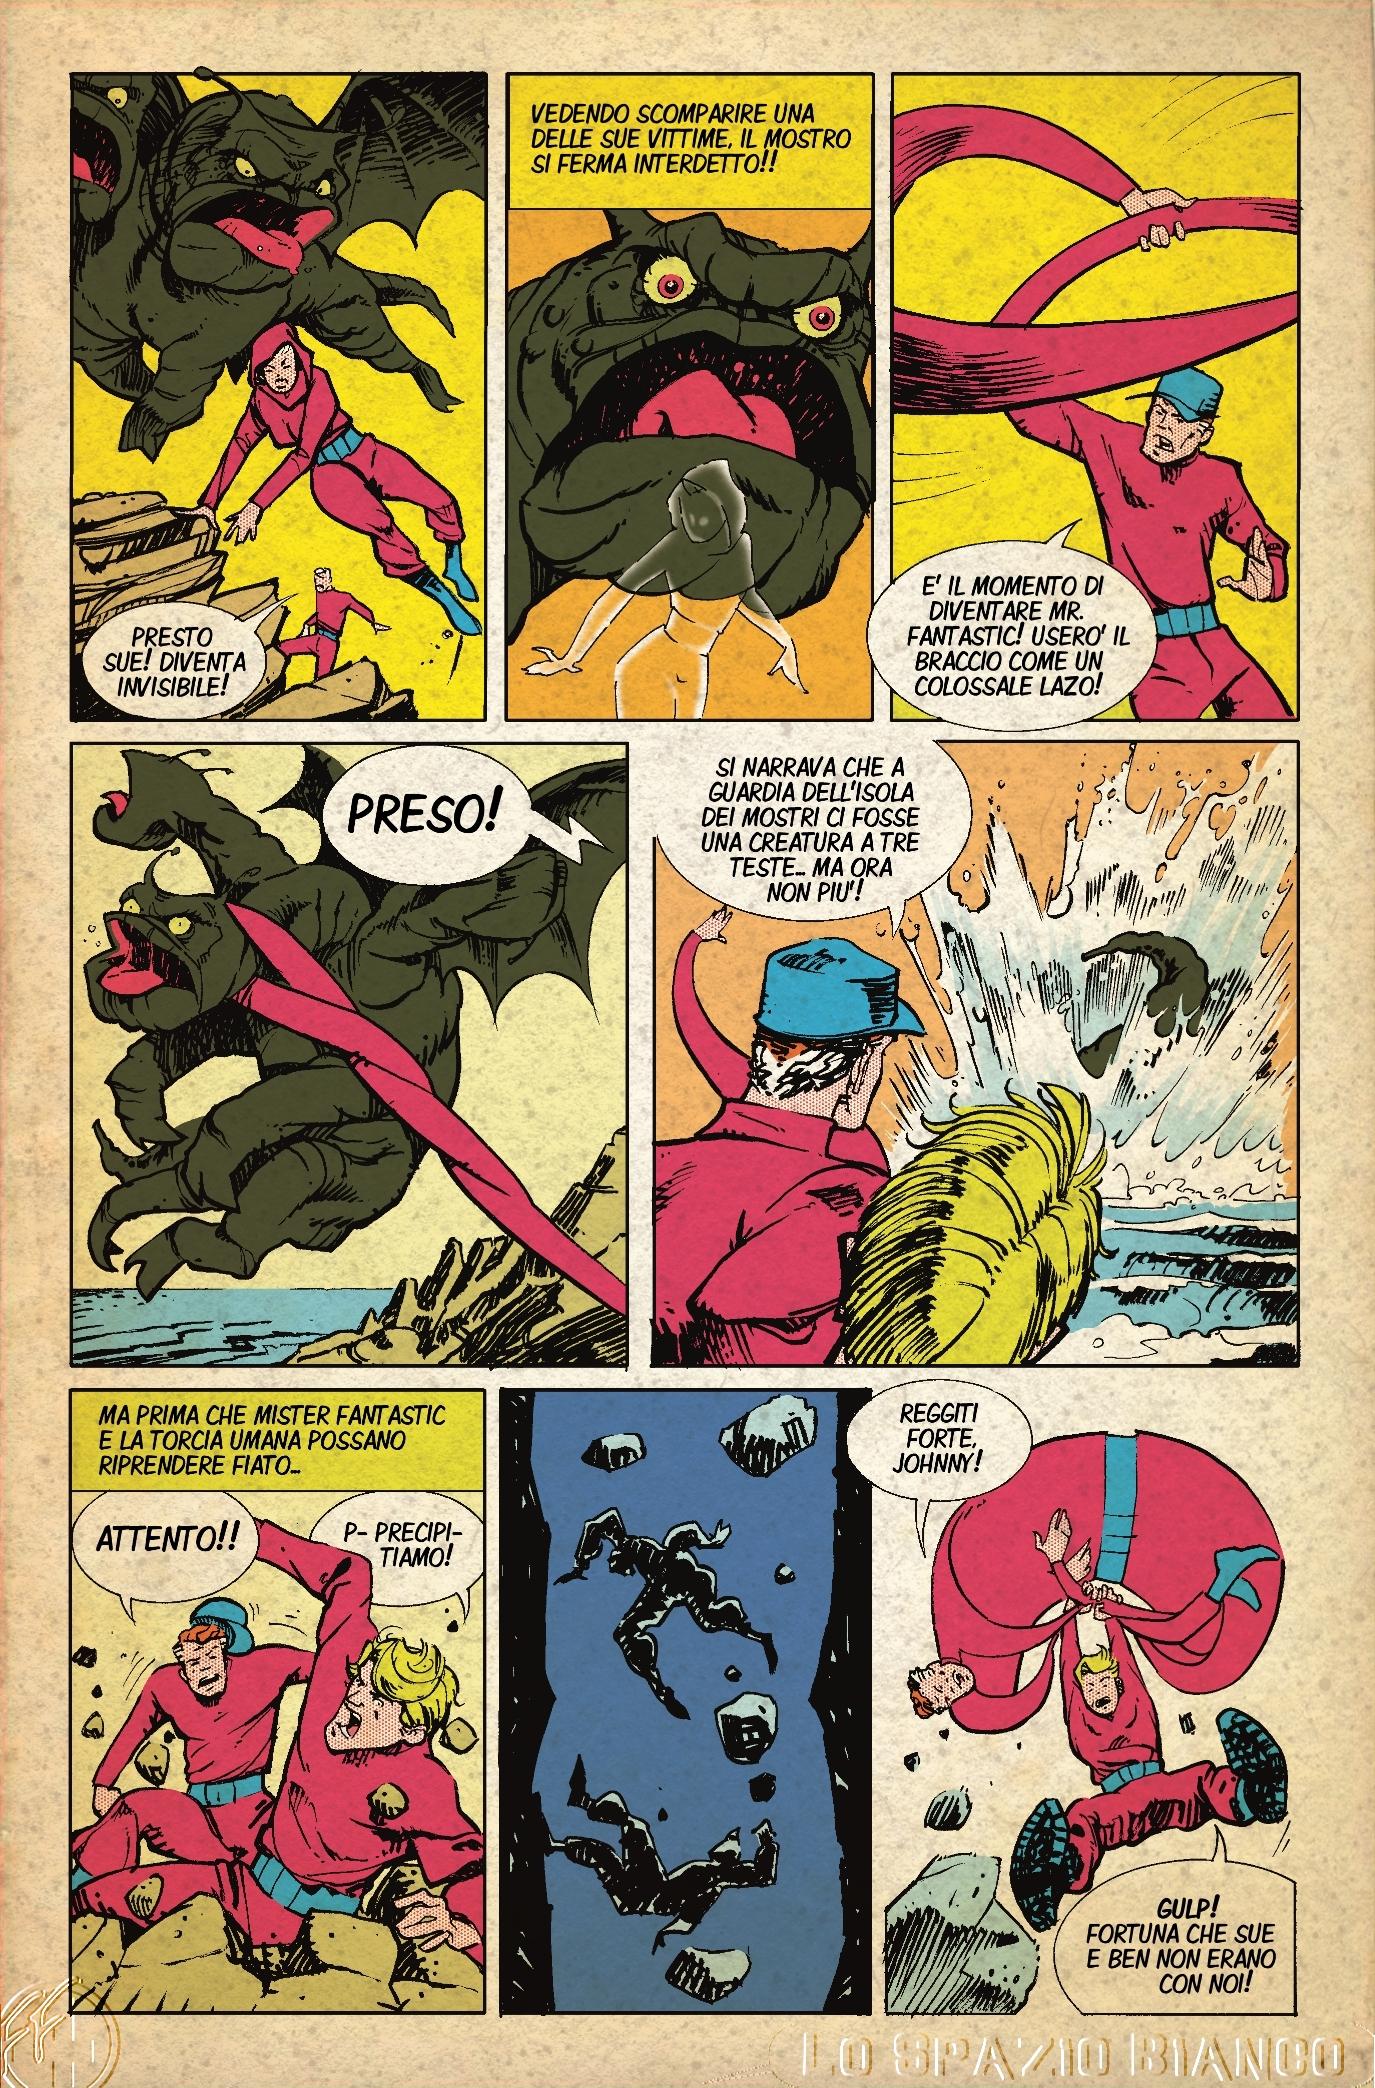 Fantastici Quattro (Mole Man 1) Pagina 5 (Mario Ferracina)